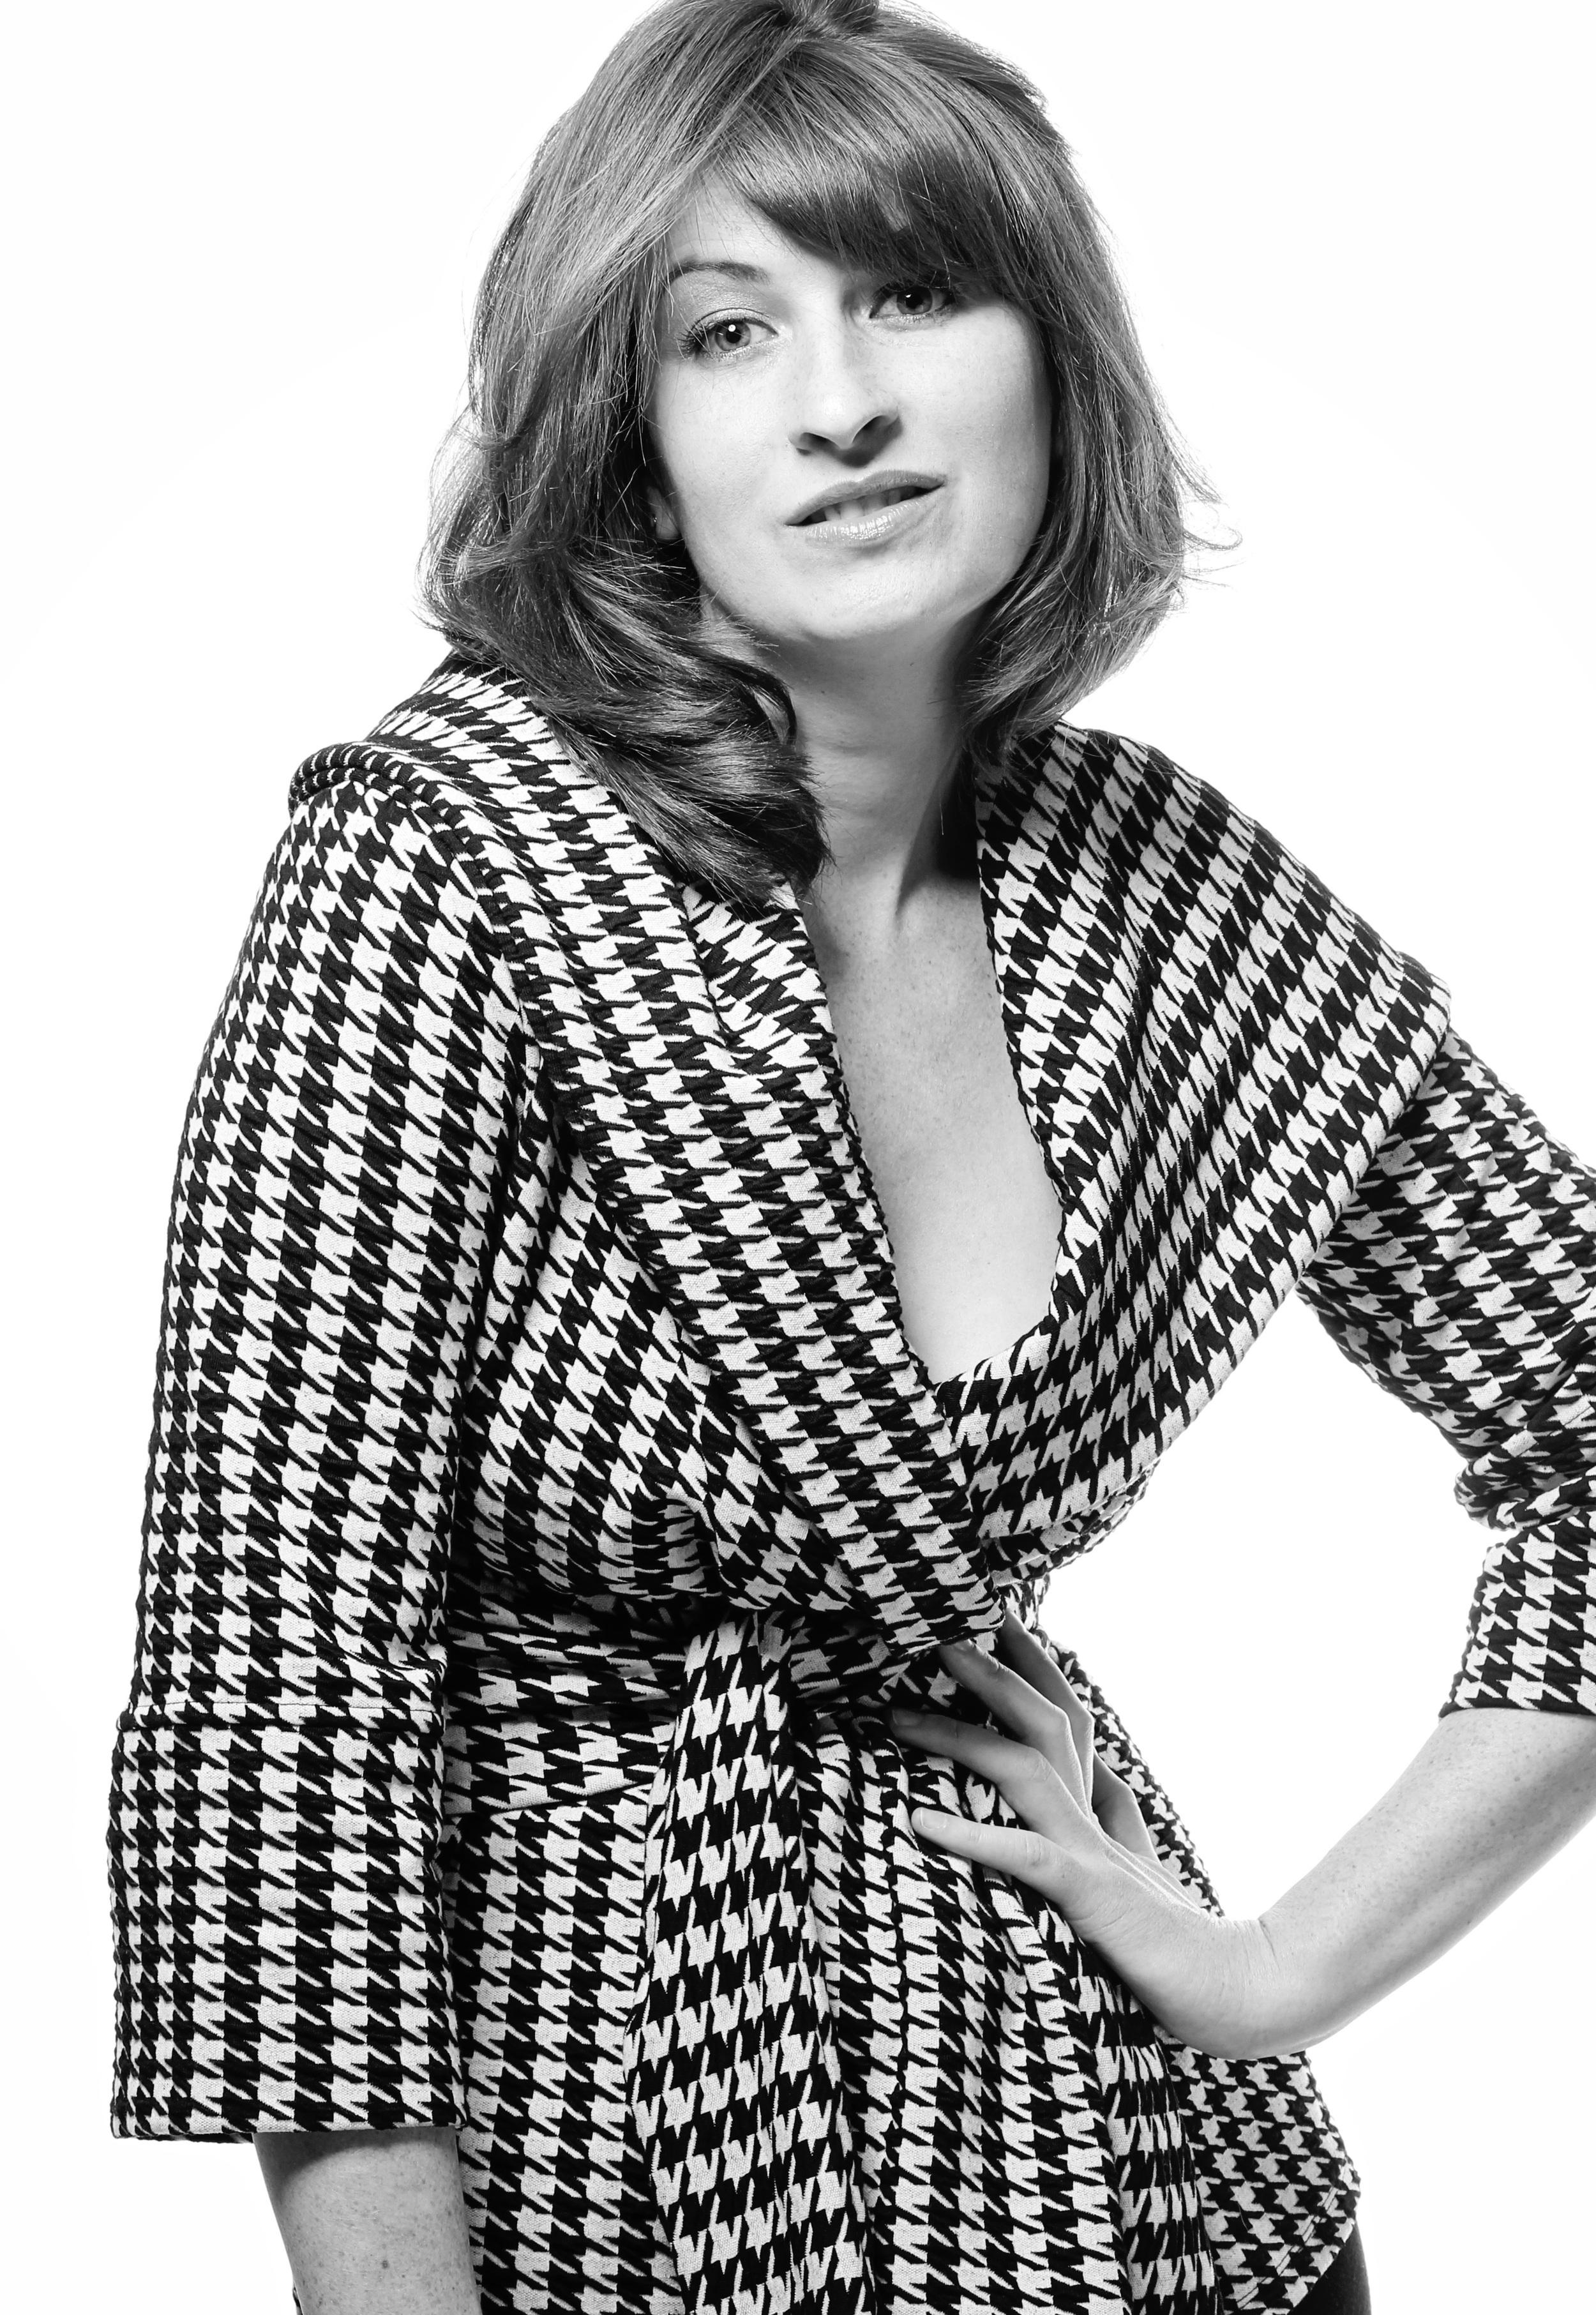 Project Houndstooth, Model Jessica Stark